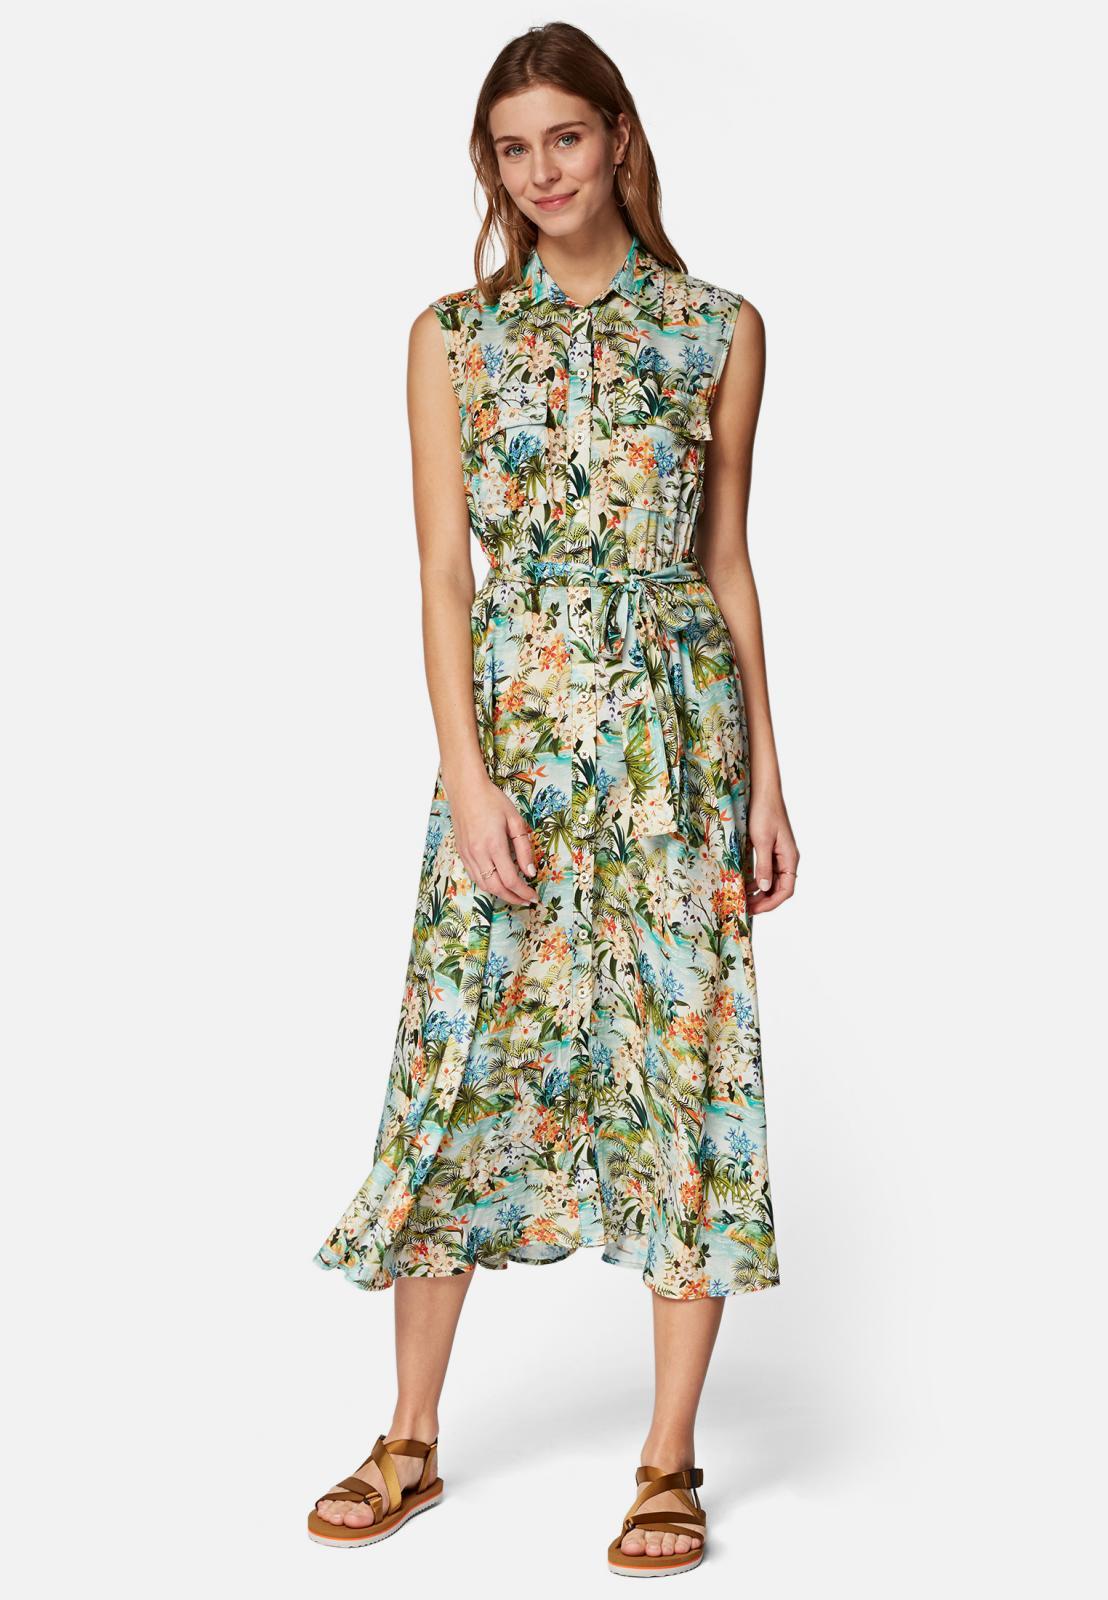 Mavi Kleid mit knallingem Blumenmuster